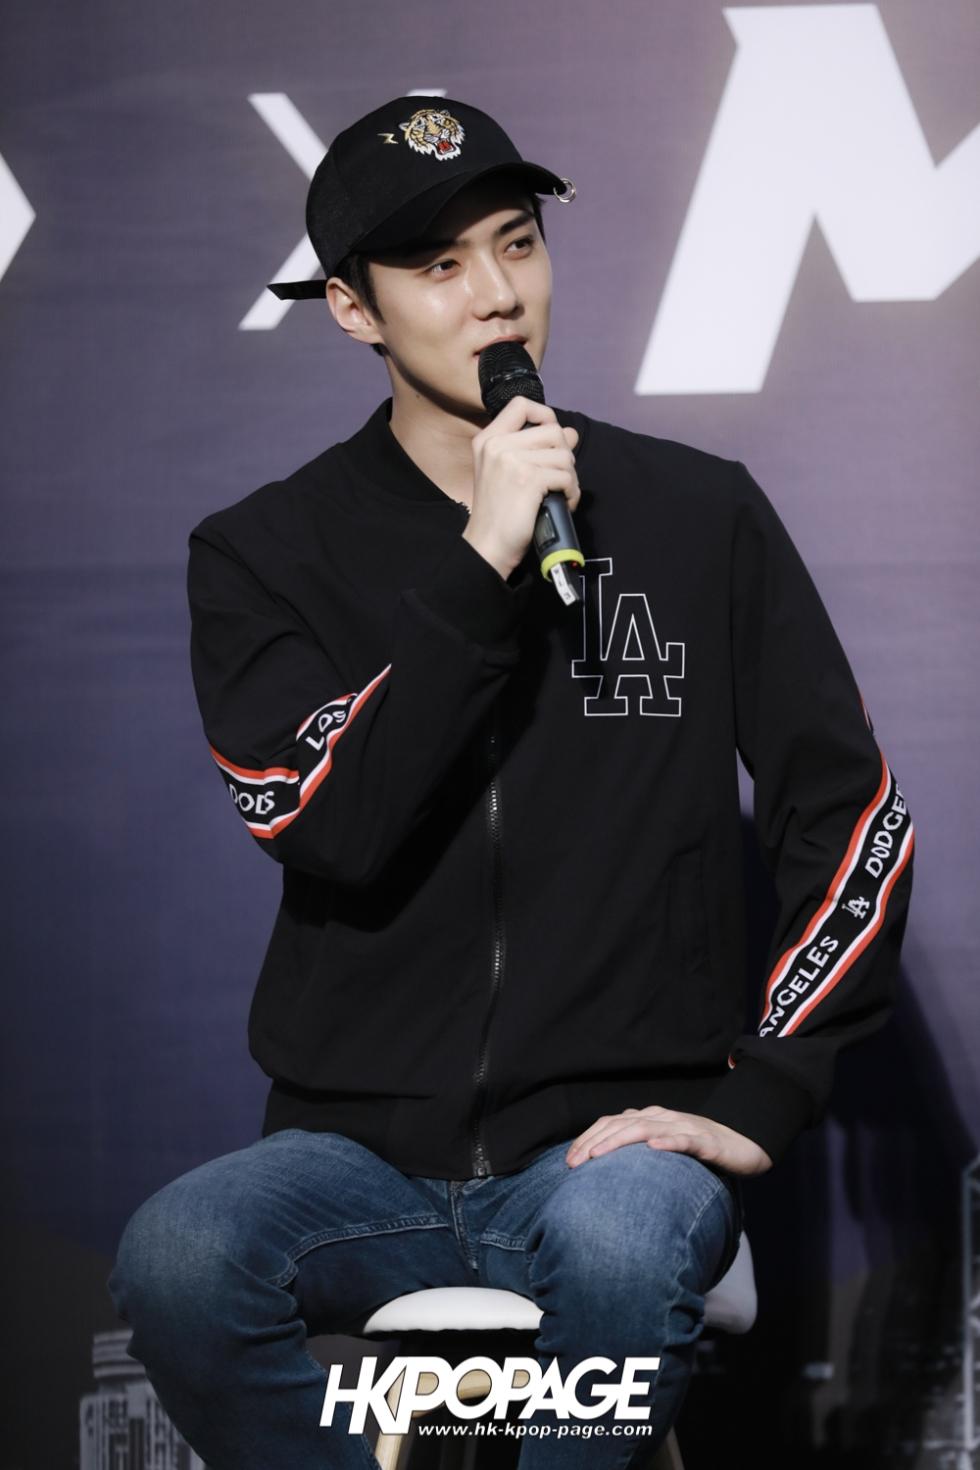 [HK.KPOP.PAGE] 180323_EXO_Chanyeol Kai Sehun_MLB Event_25